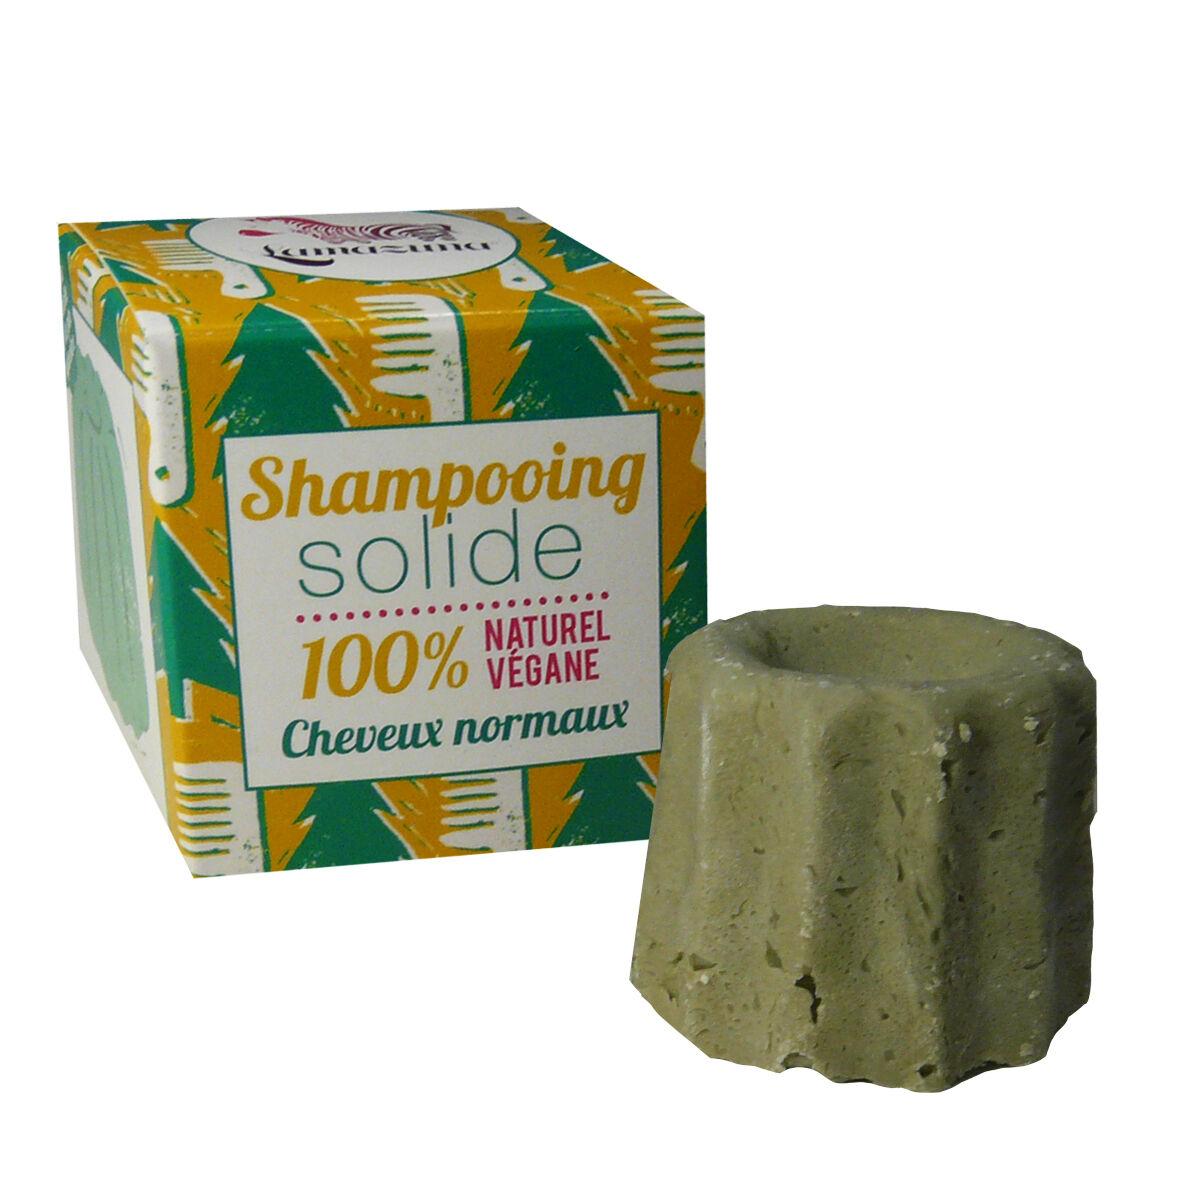 Lamazuna shampooing solide 100% cheveux normaux vegane 55 g